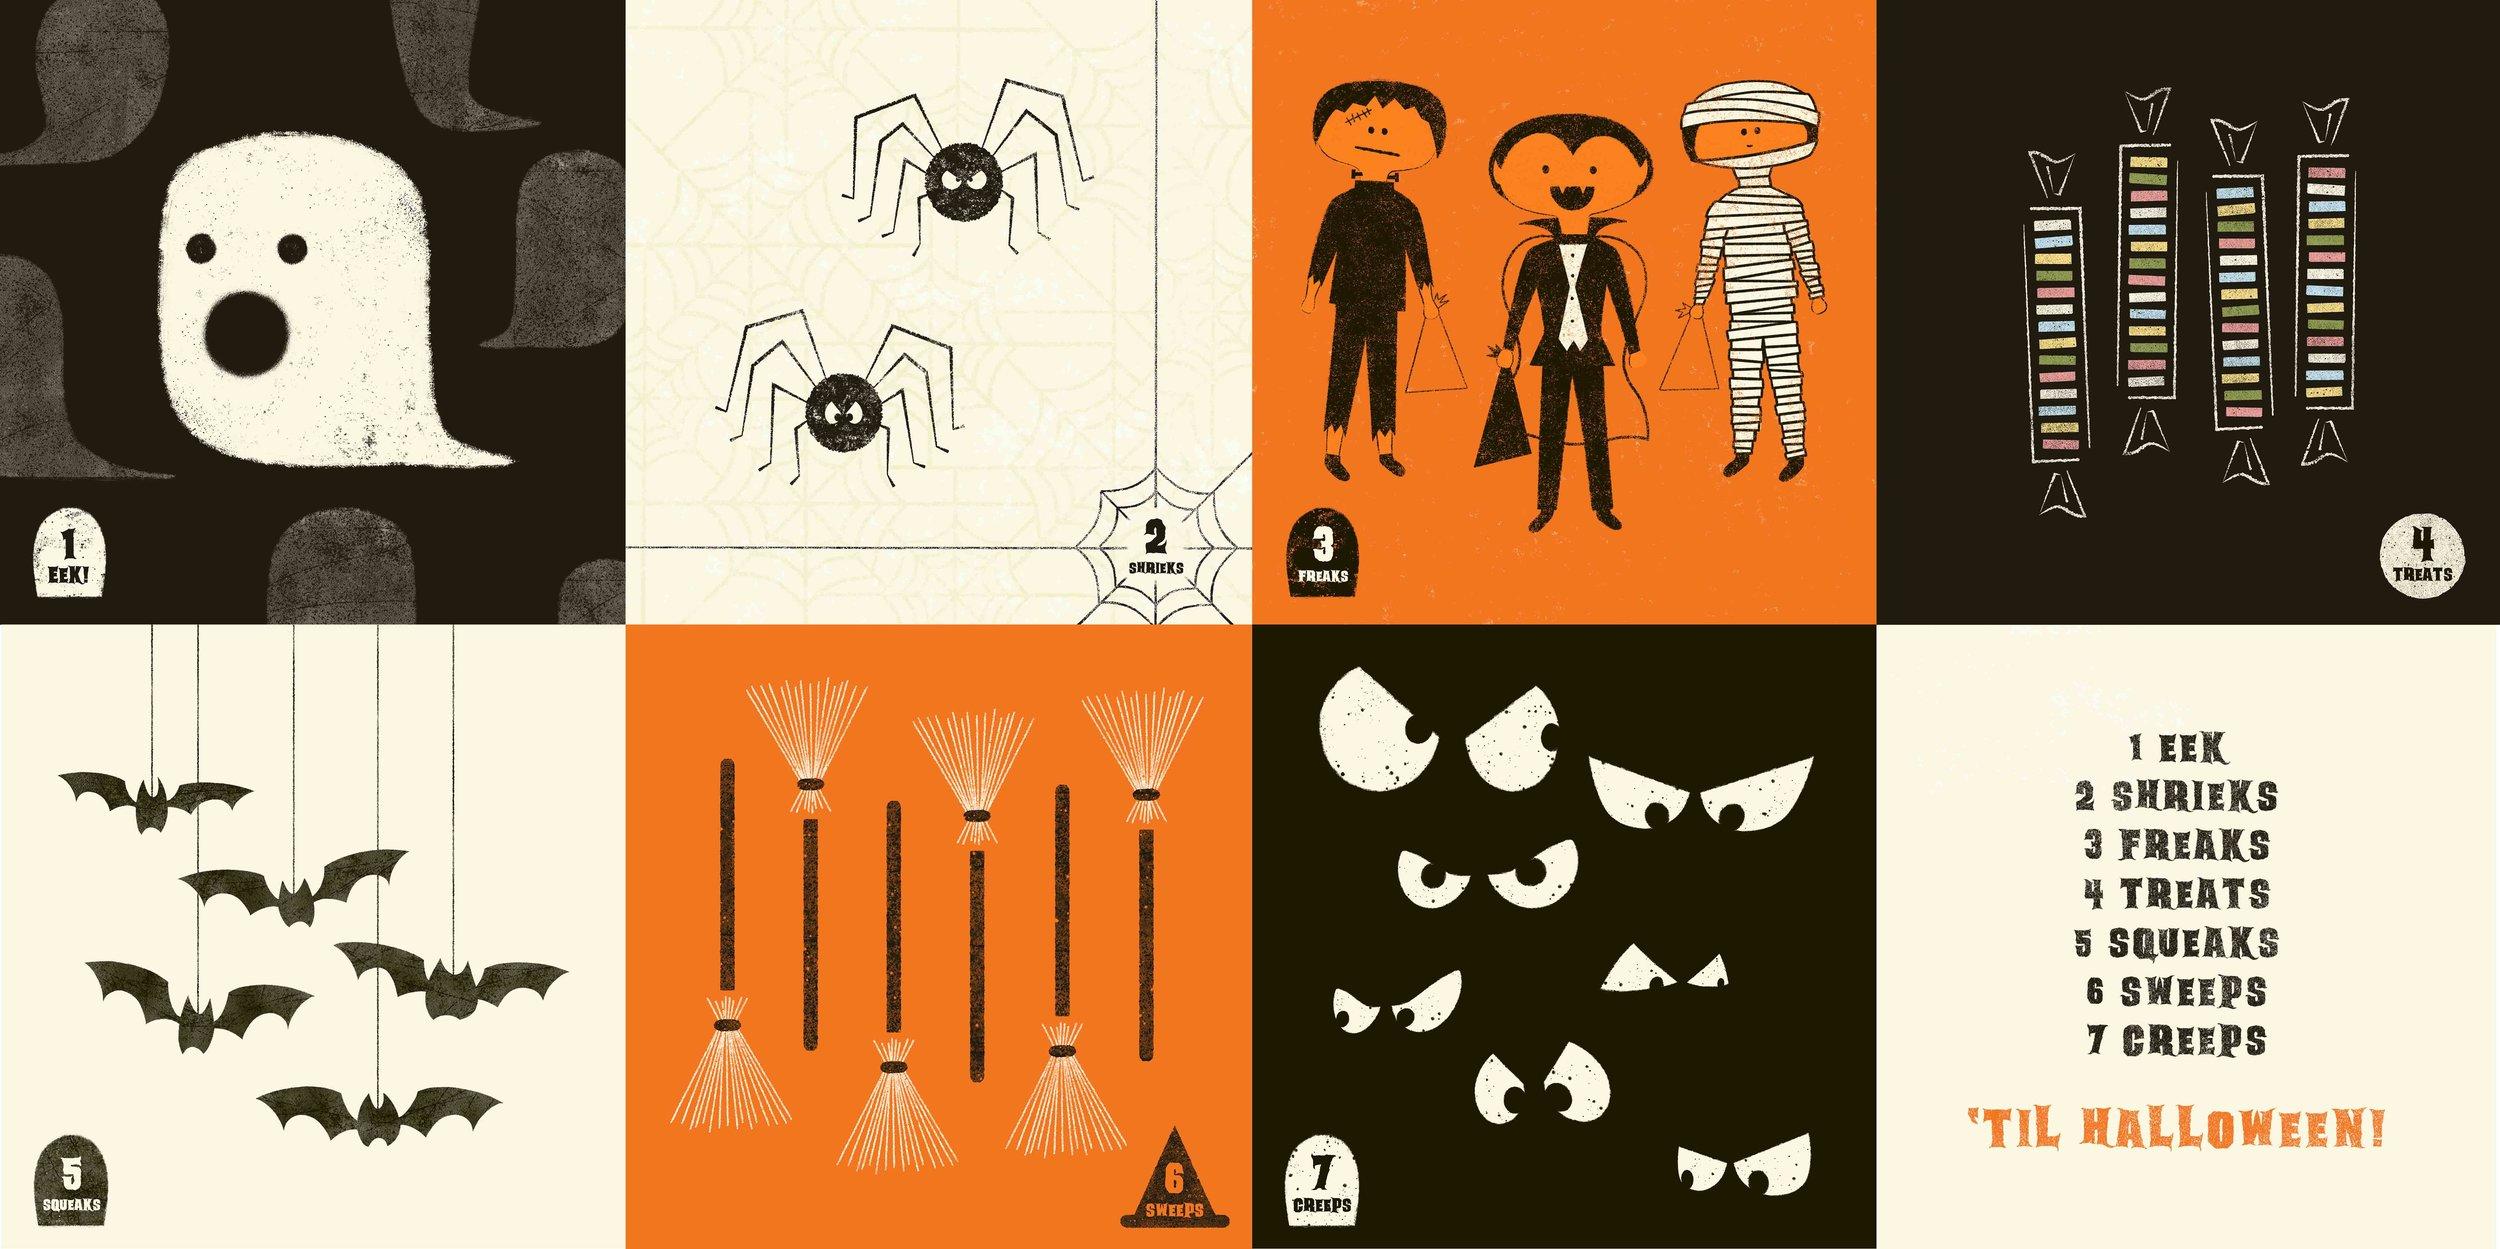 Halloween_countdown.jpg